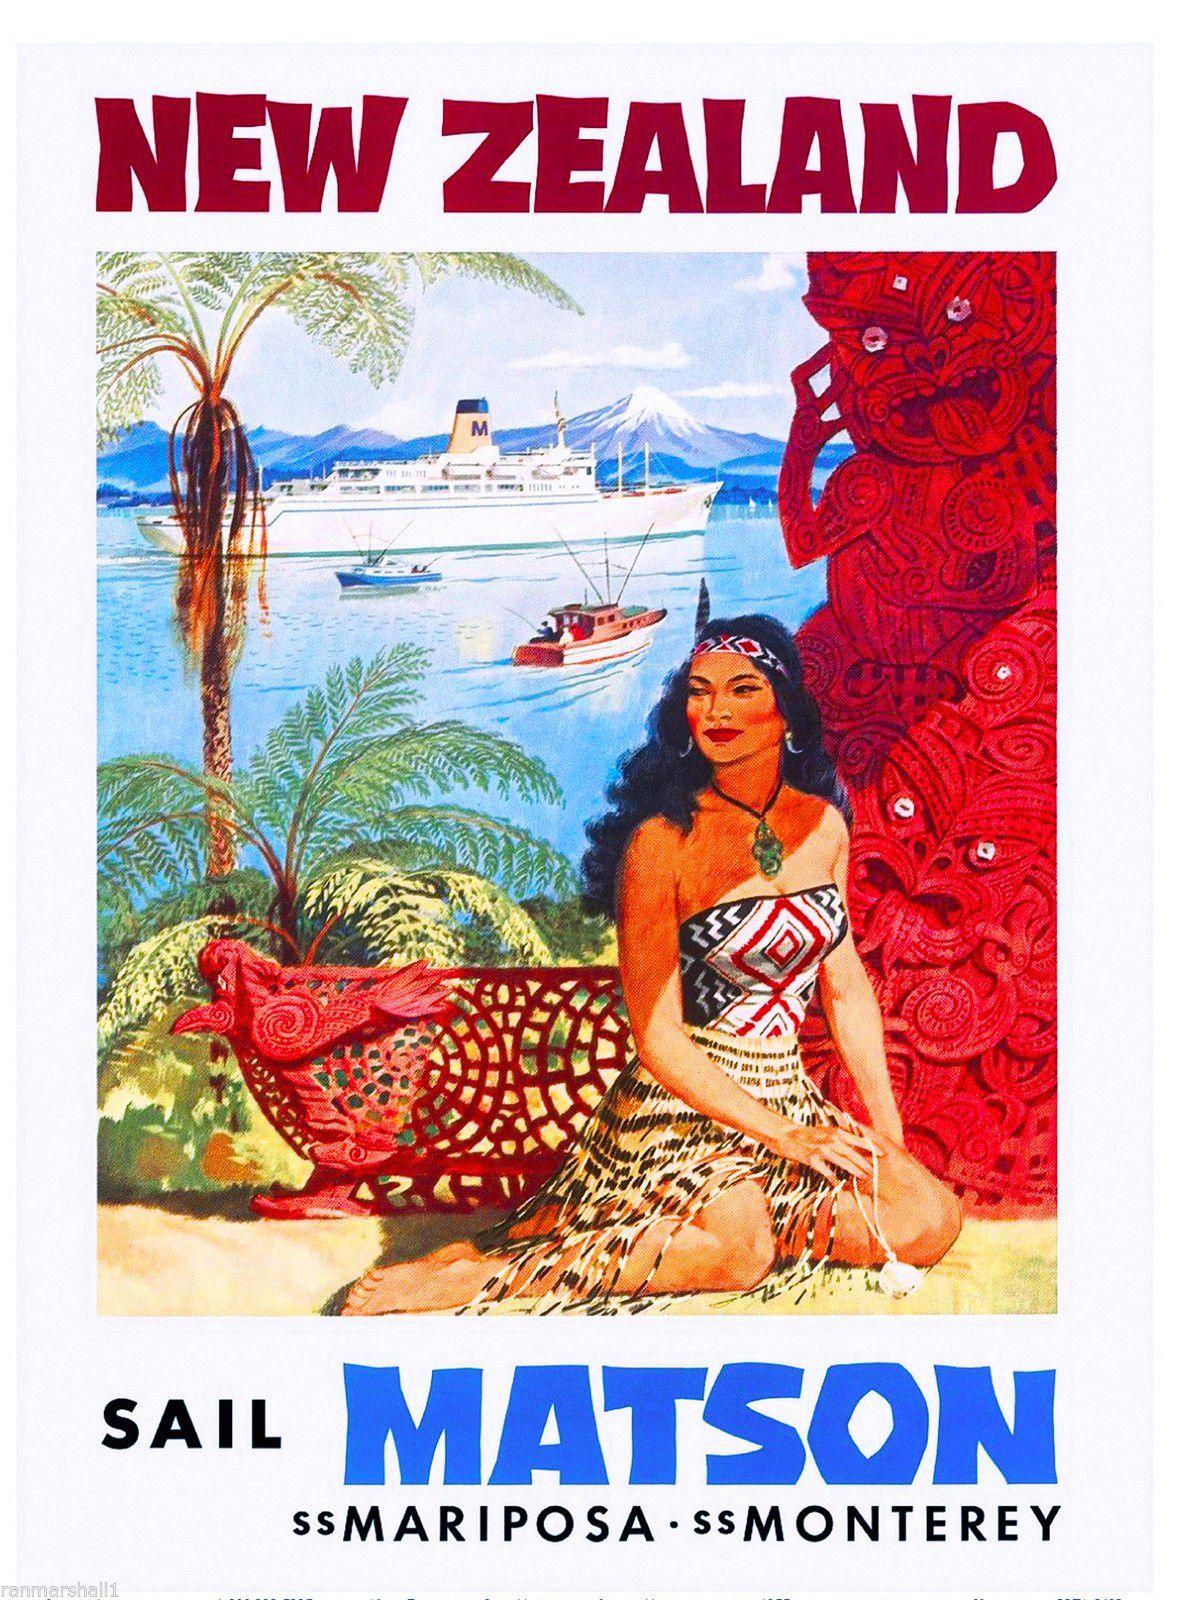 New Zealand Sail Matson Vintage Travel Advertisement Art Poster